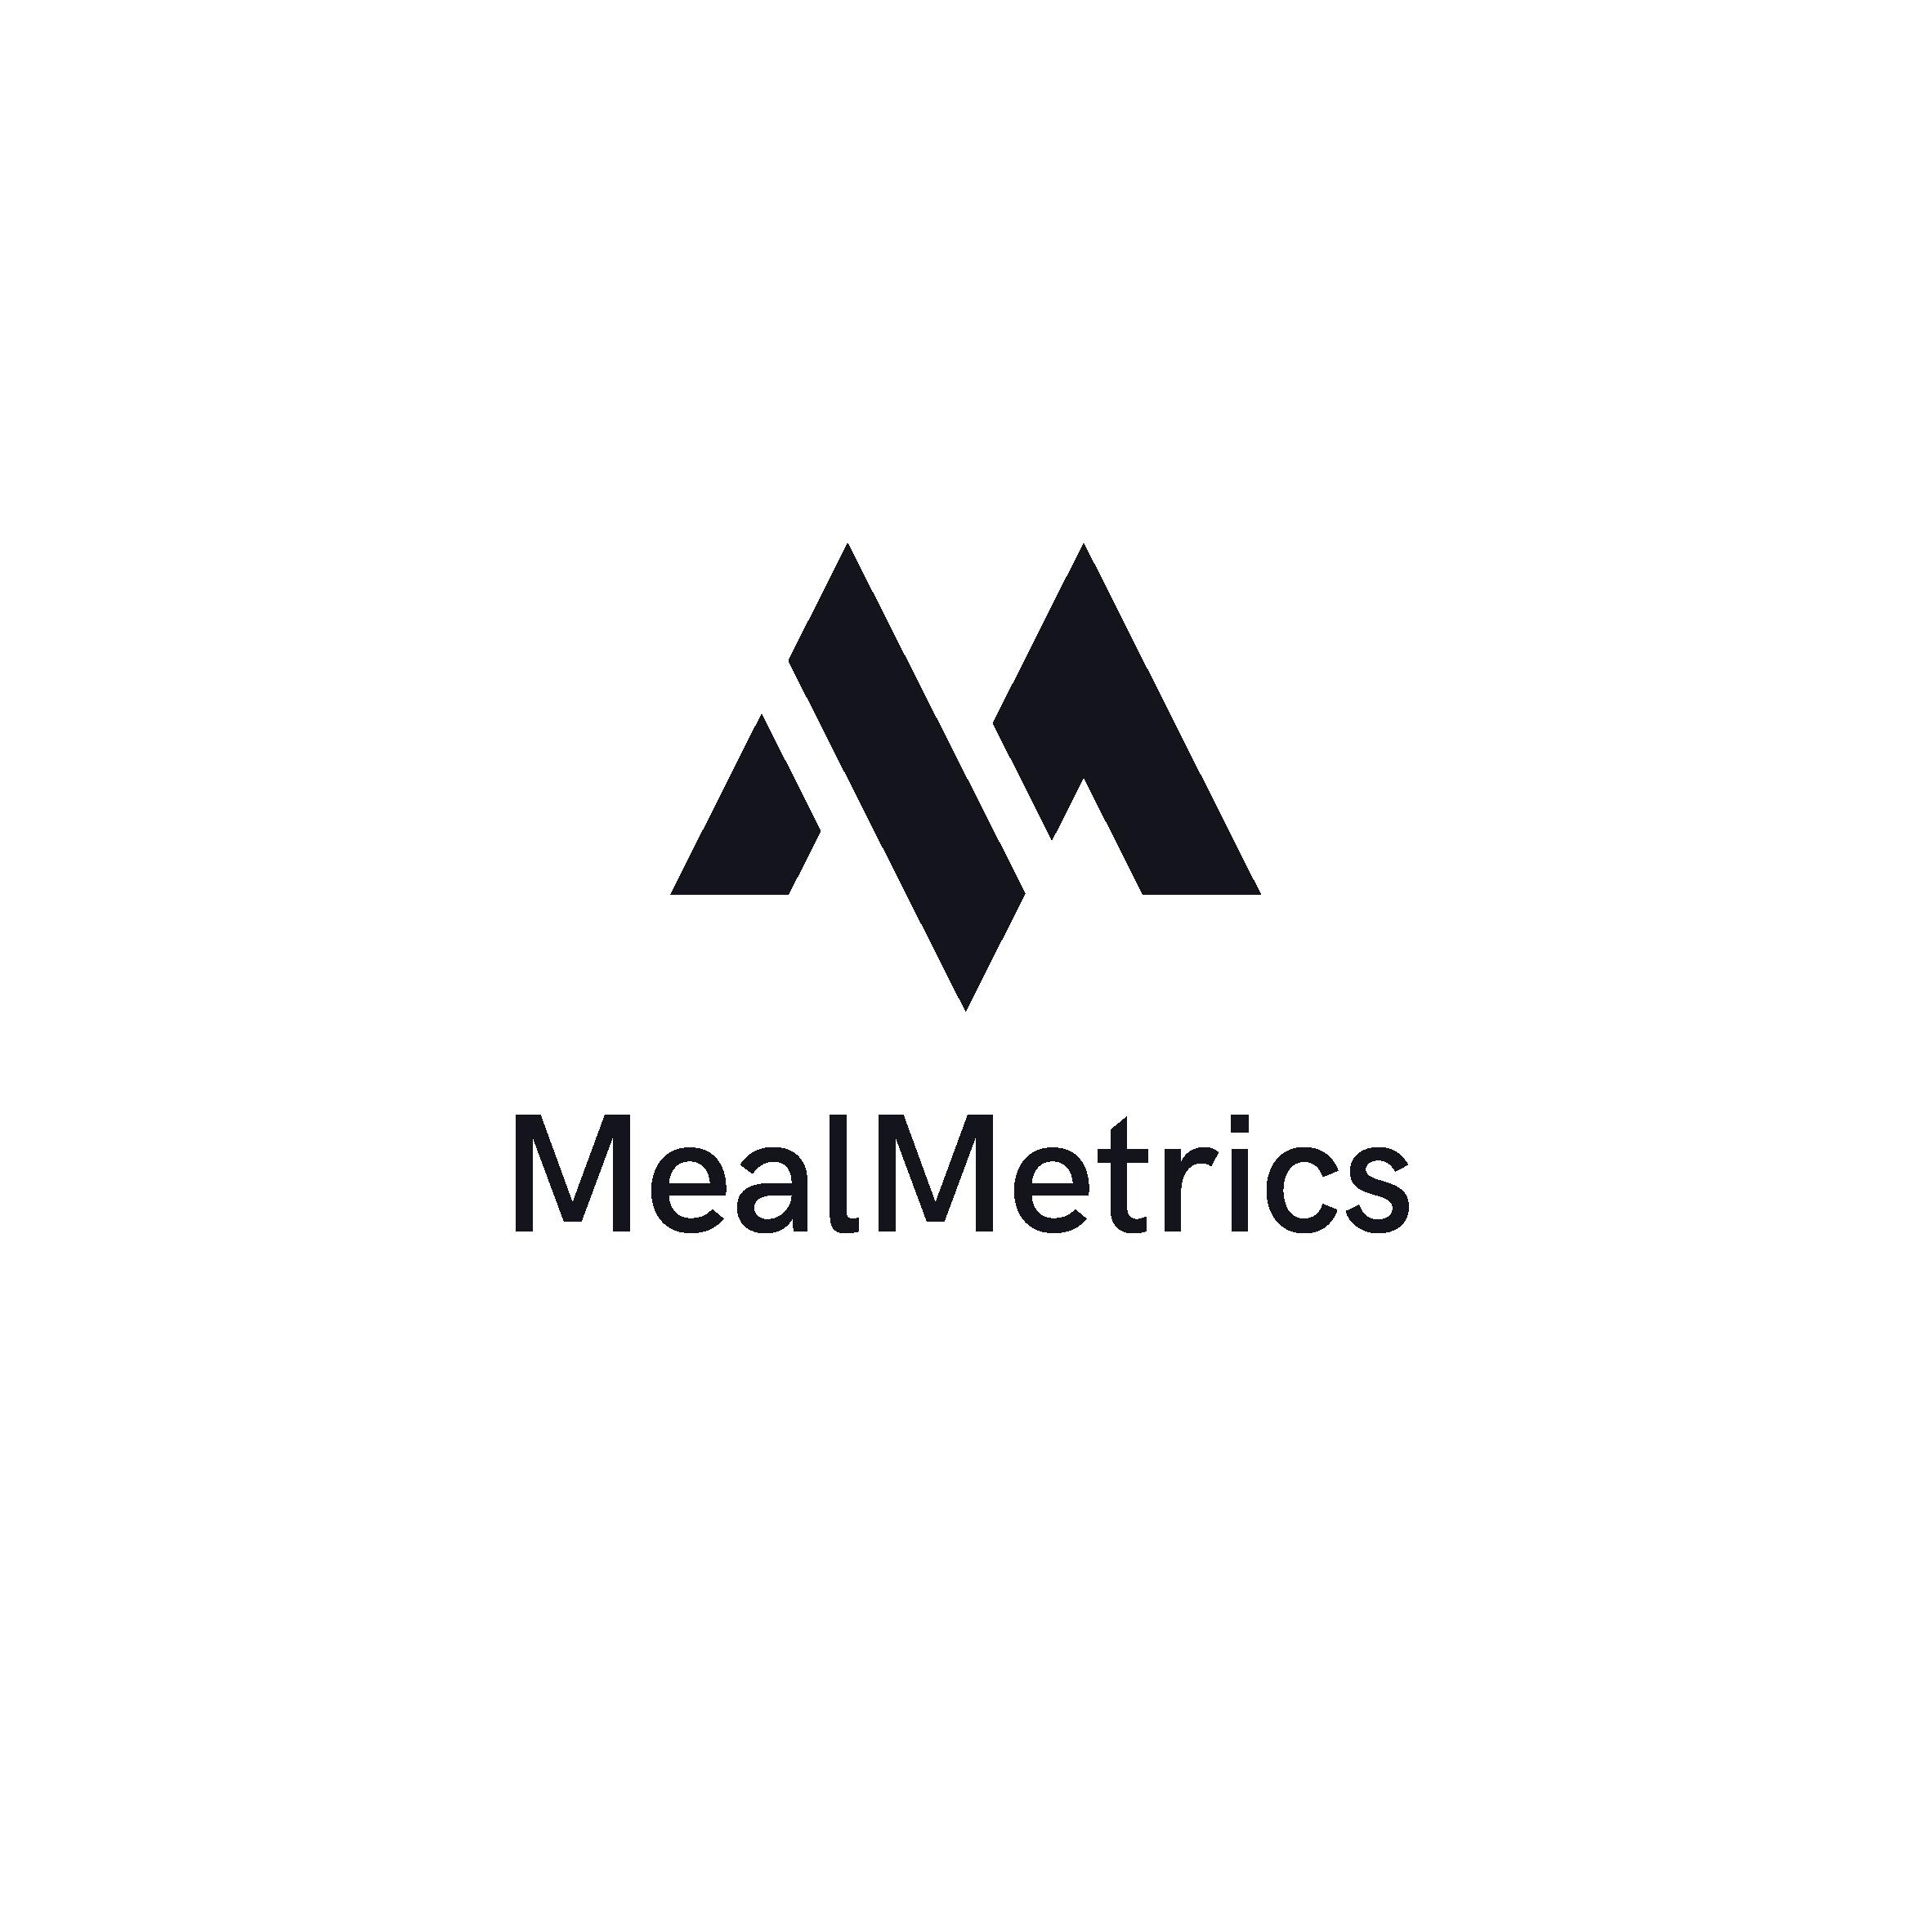 MealMetrics